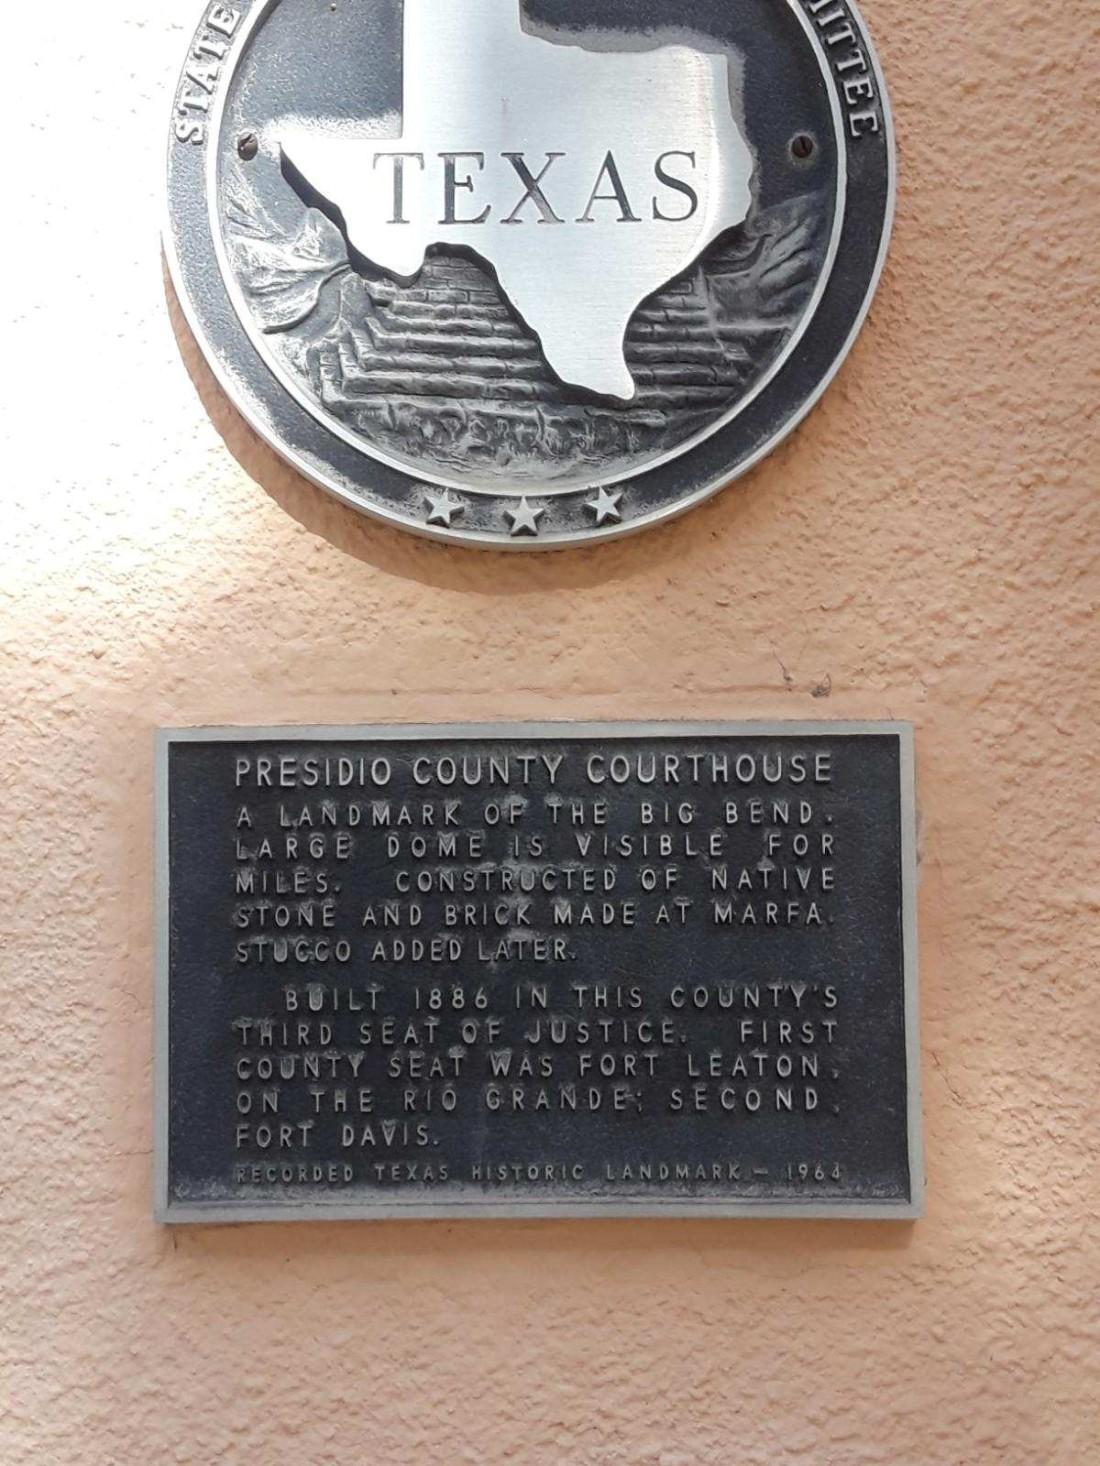 Presido County History